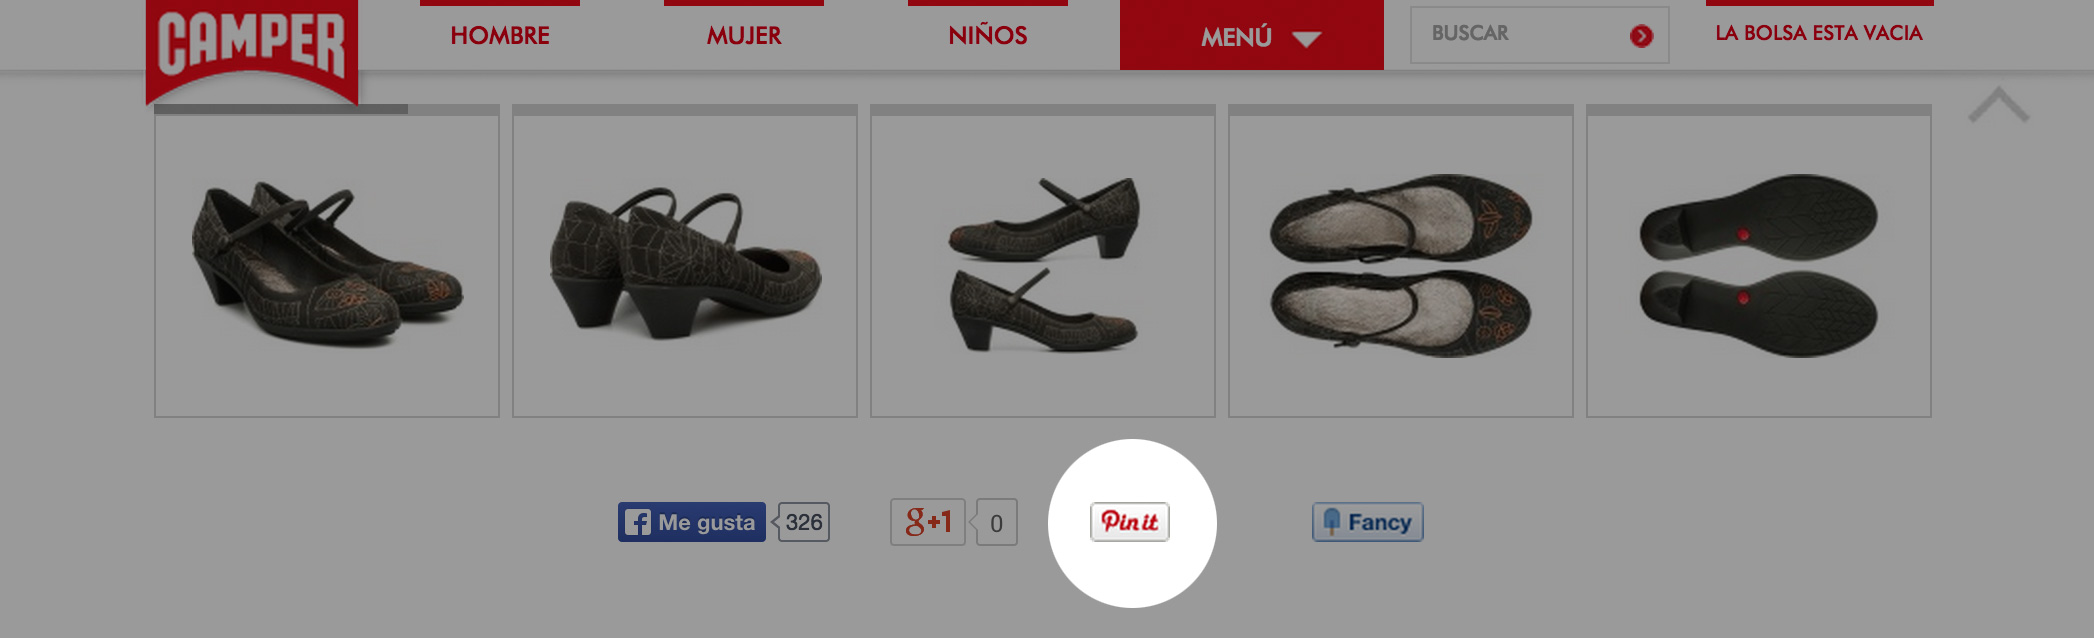 Pinterest empresas Camper botón social